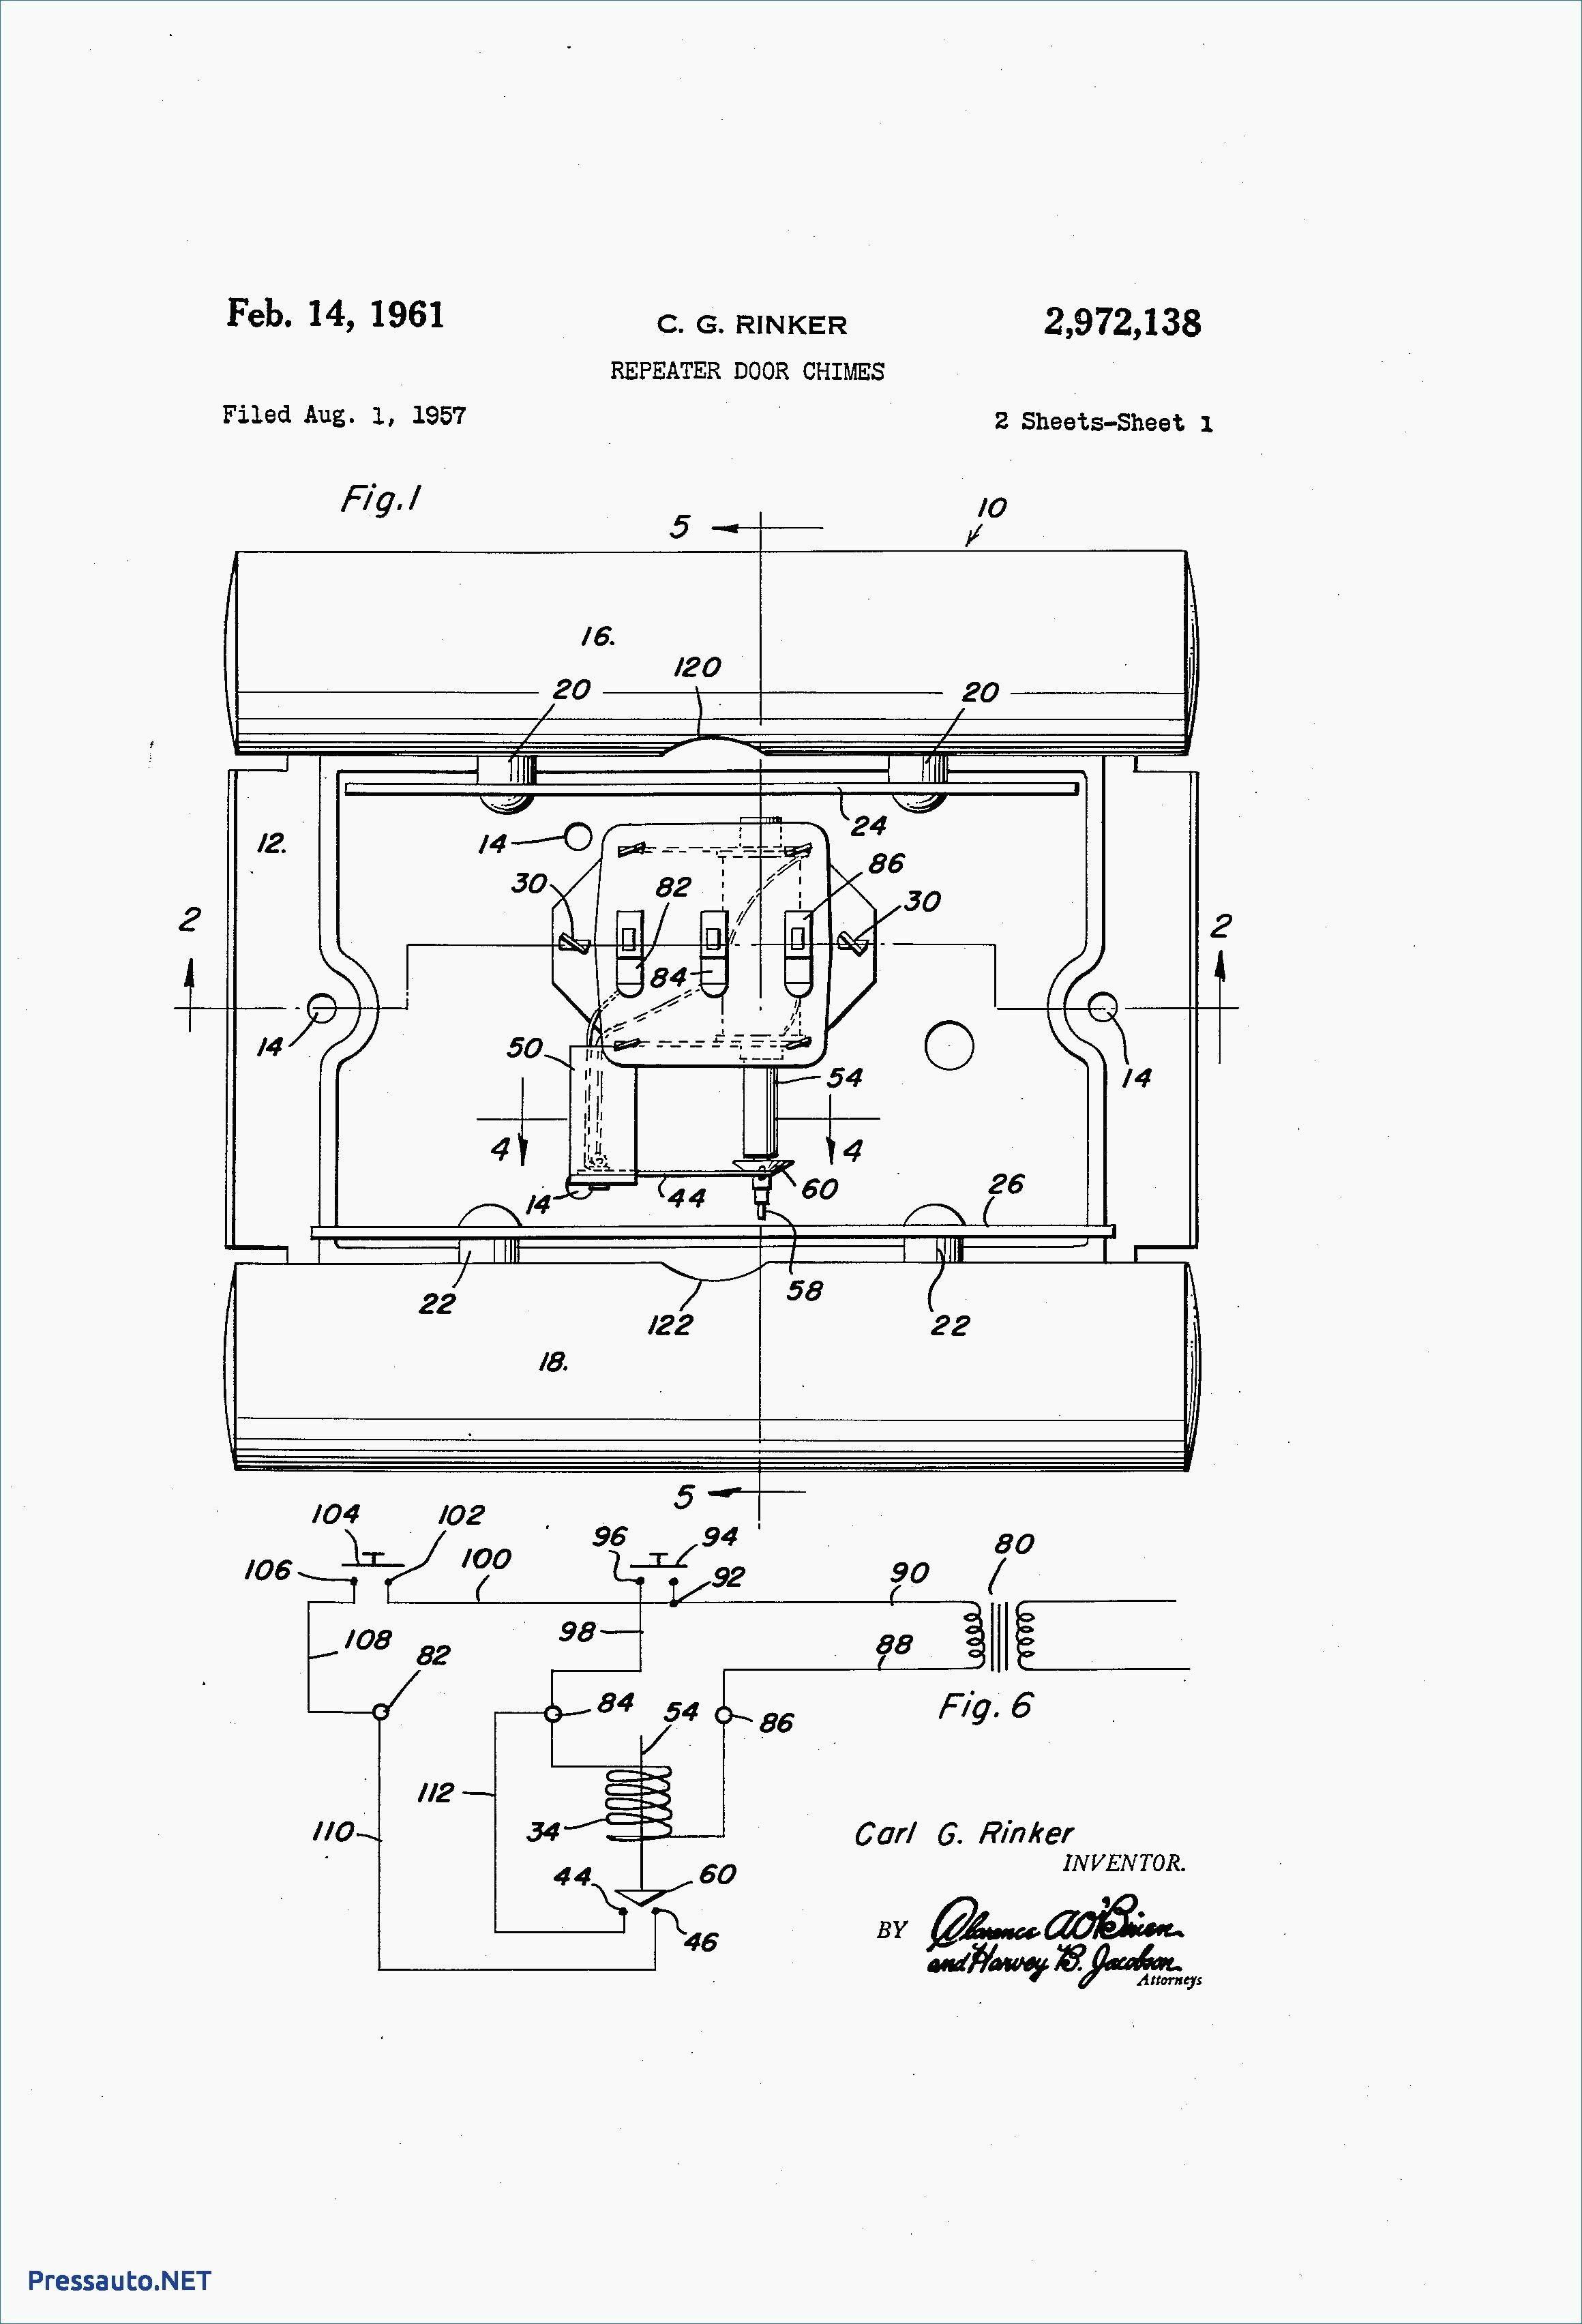 New Doorbell Wiring Diagram Tutorial  Diagram  Diagramsample  Diagramtemplate  Wiringdiagram